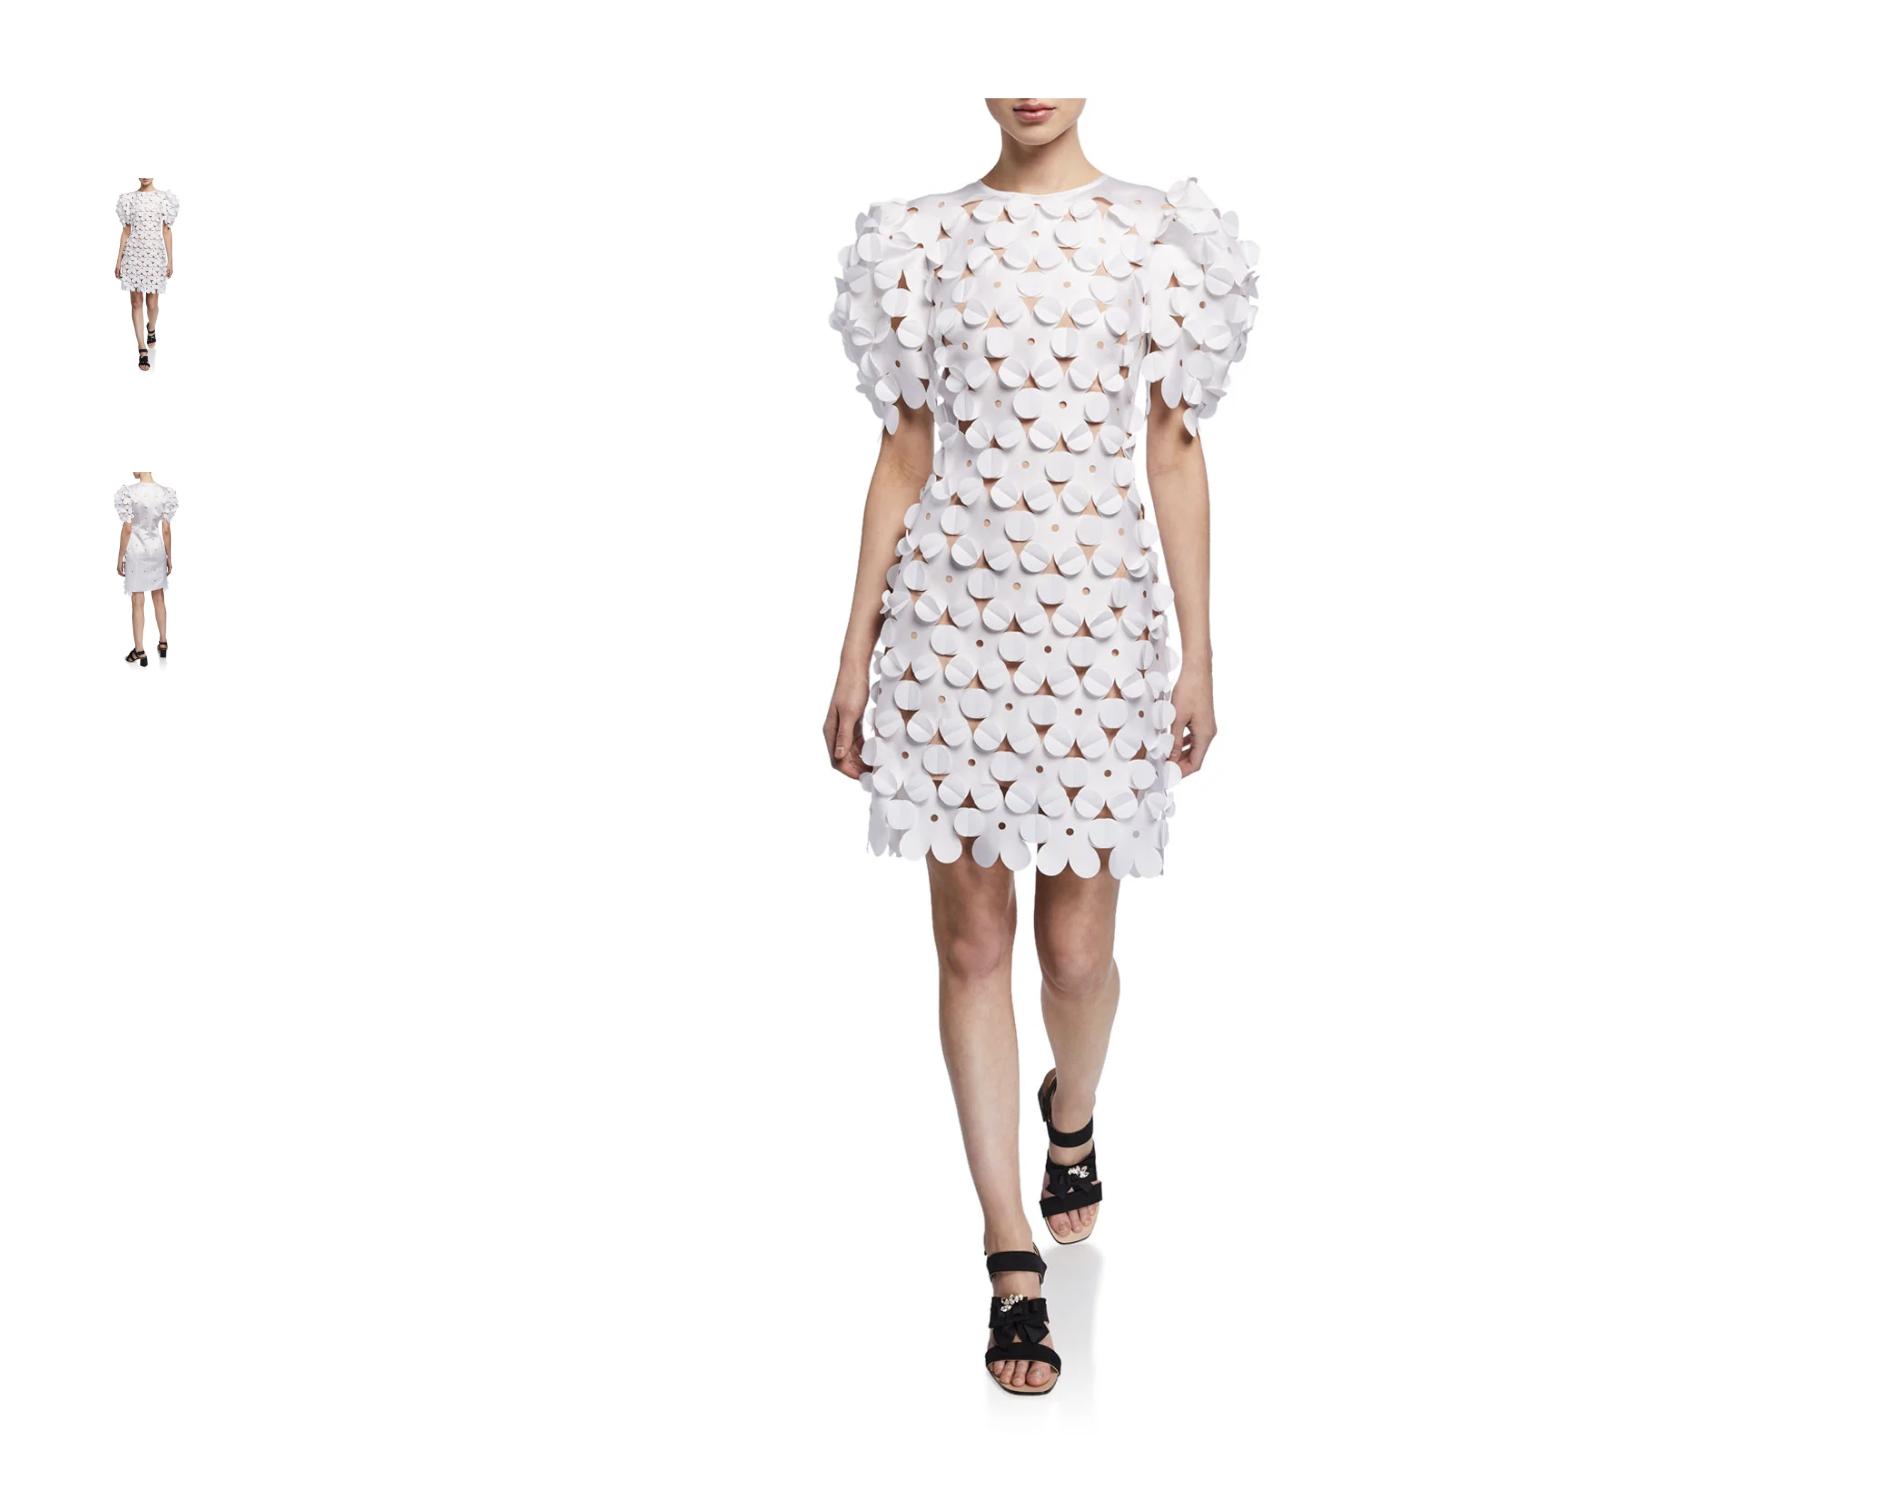 laser cut polyester dress